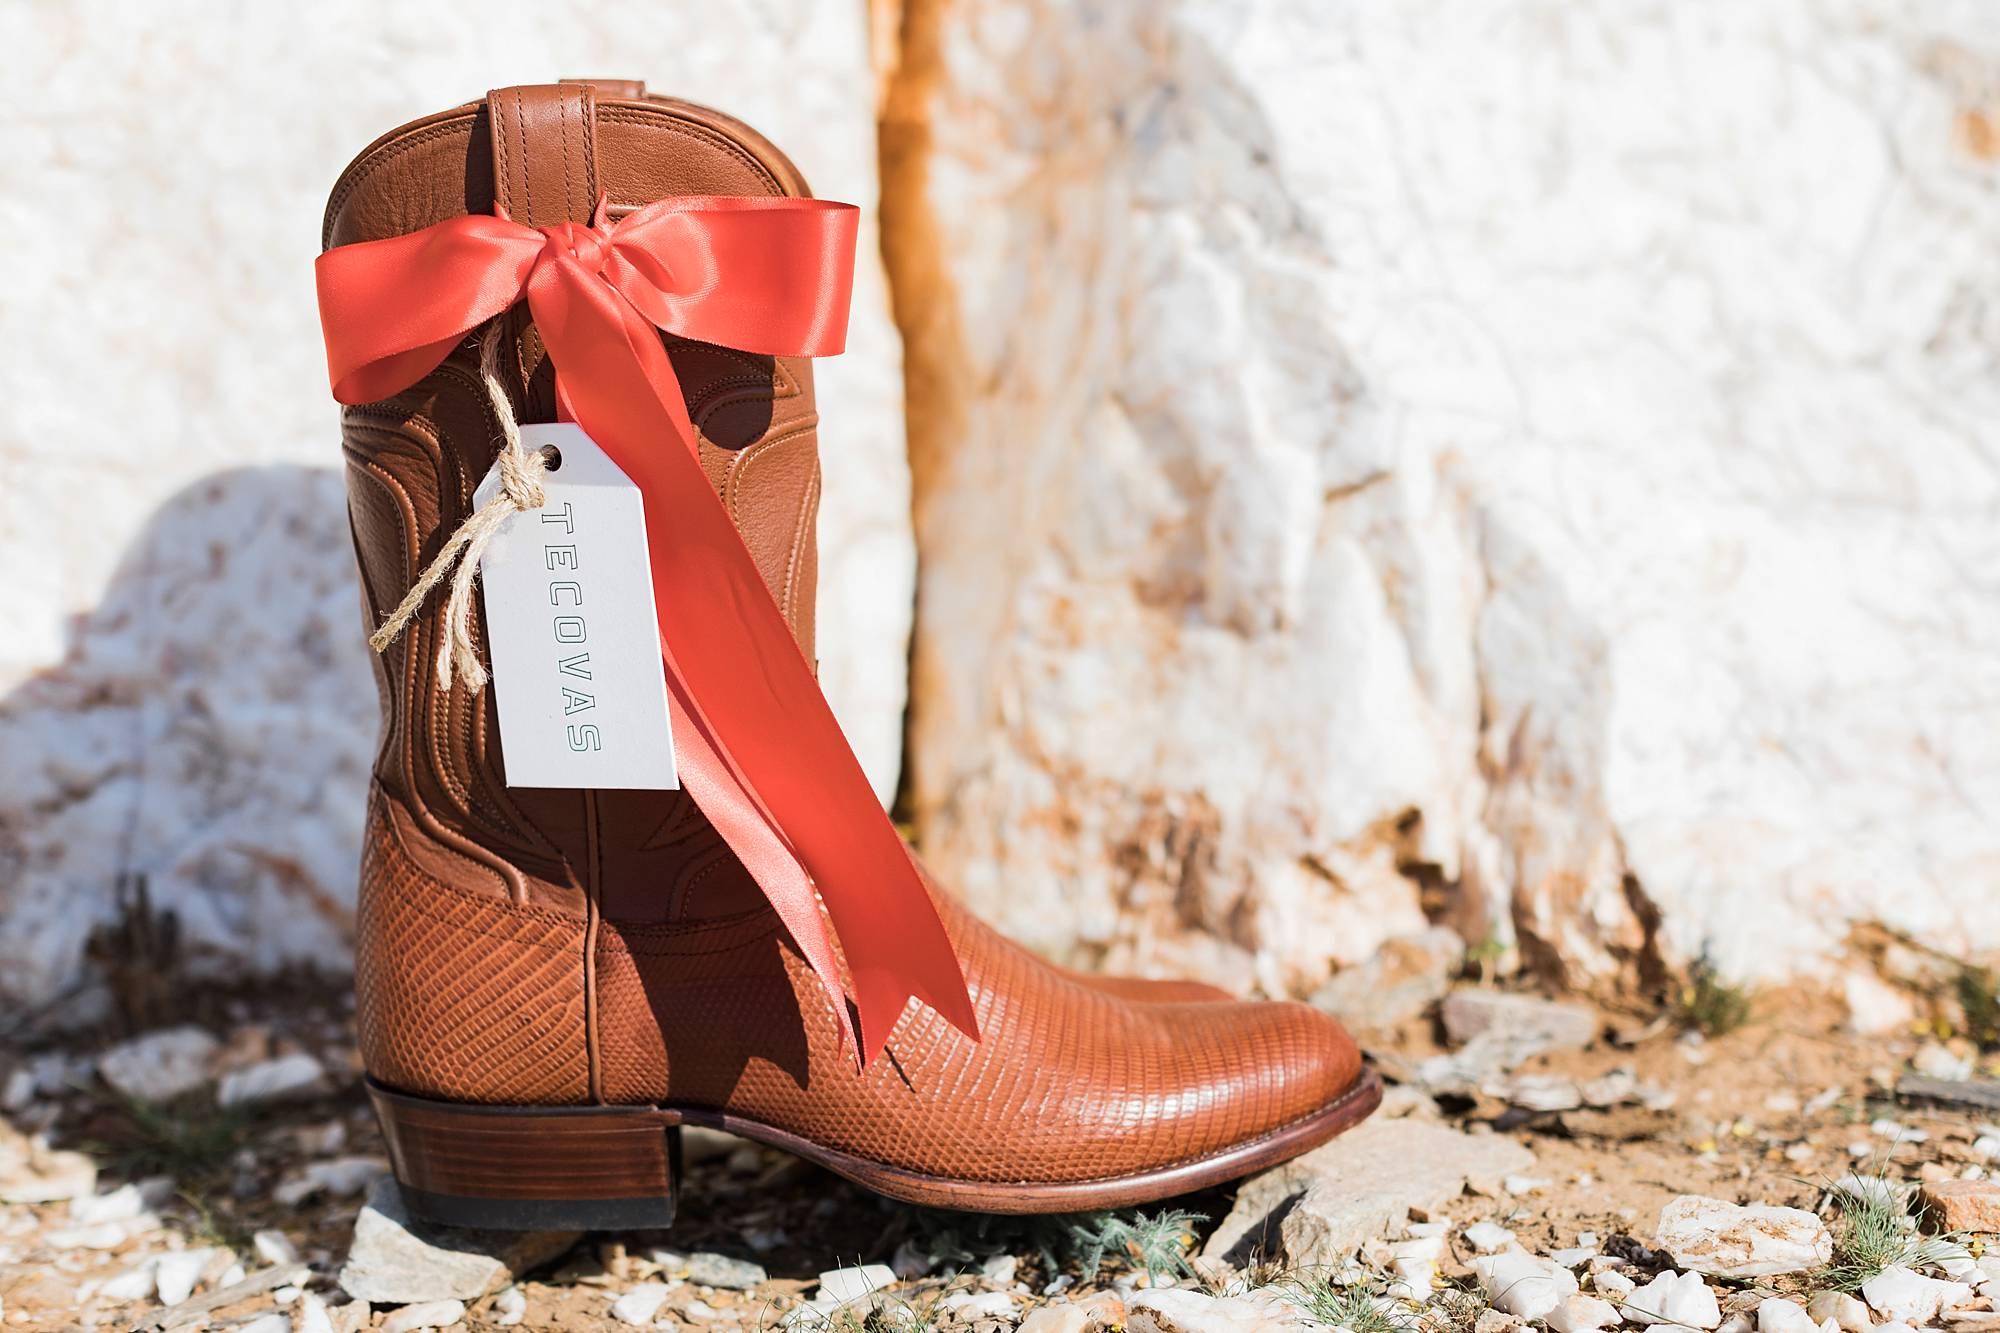 tecovas men's boots